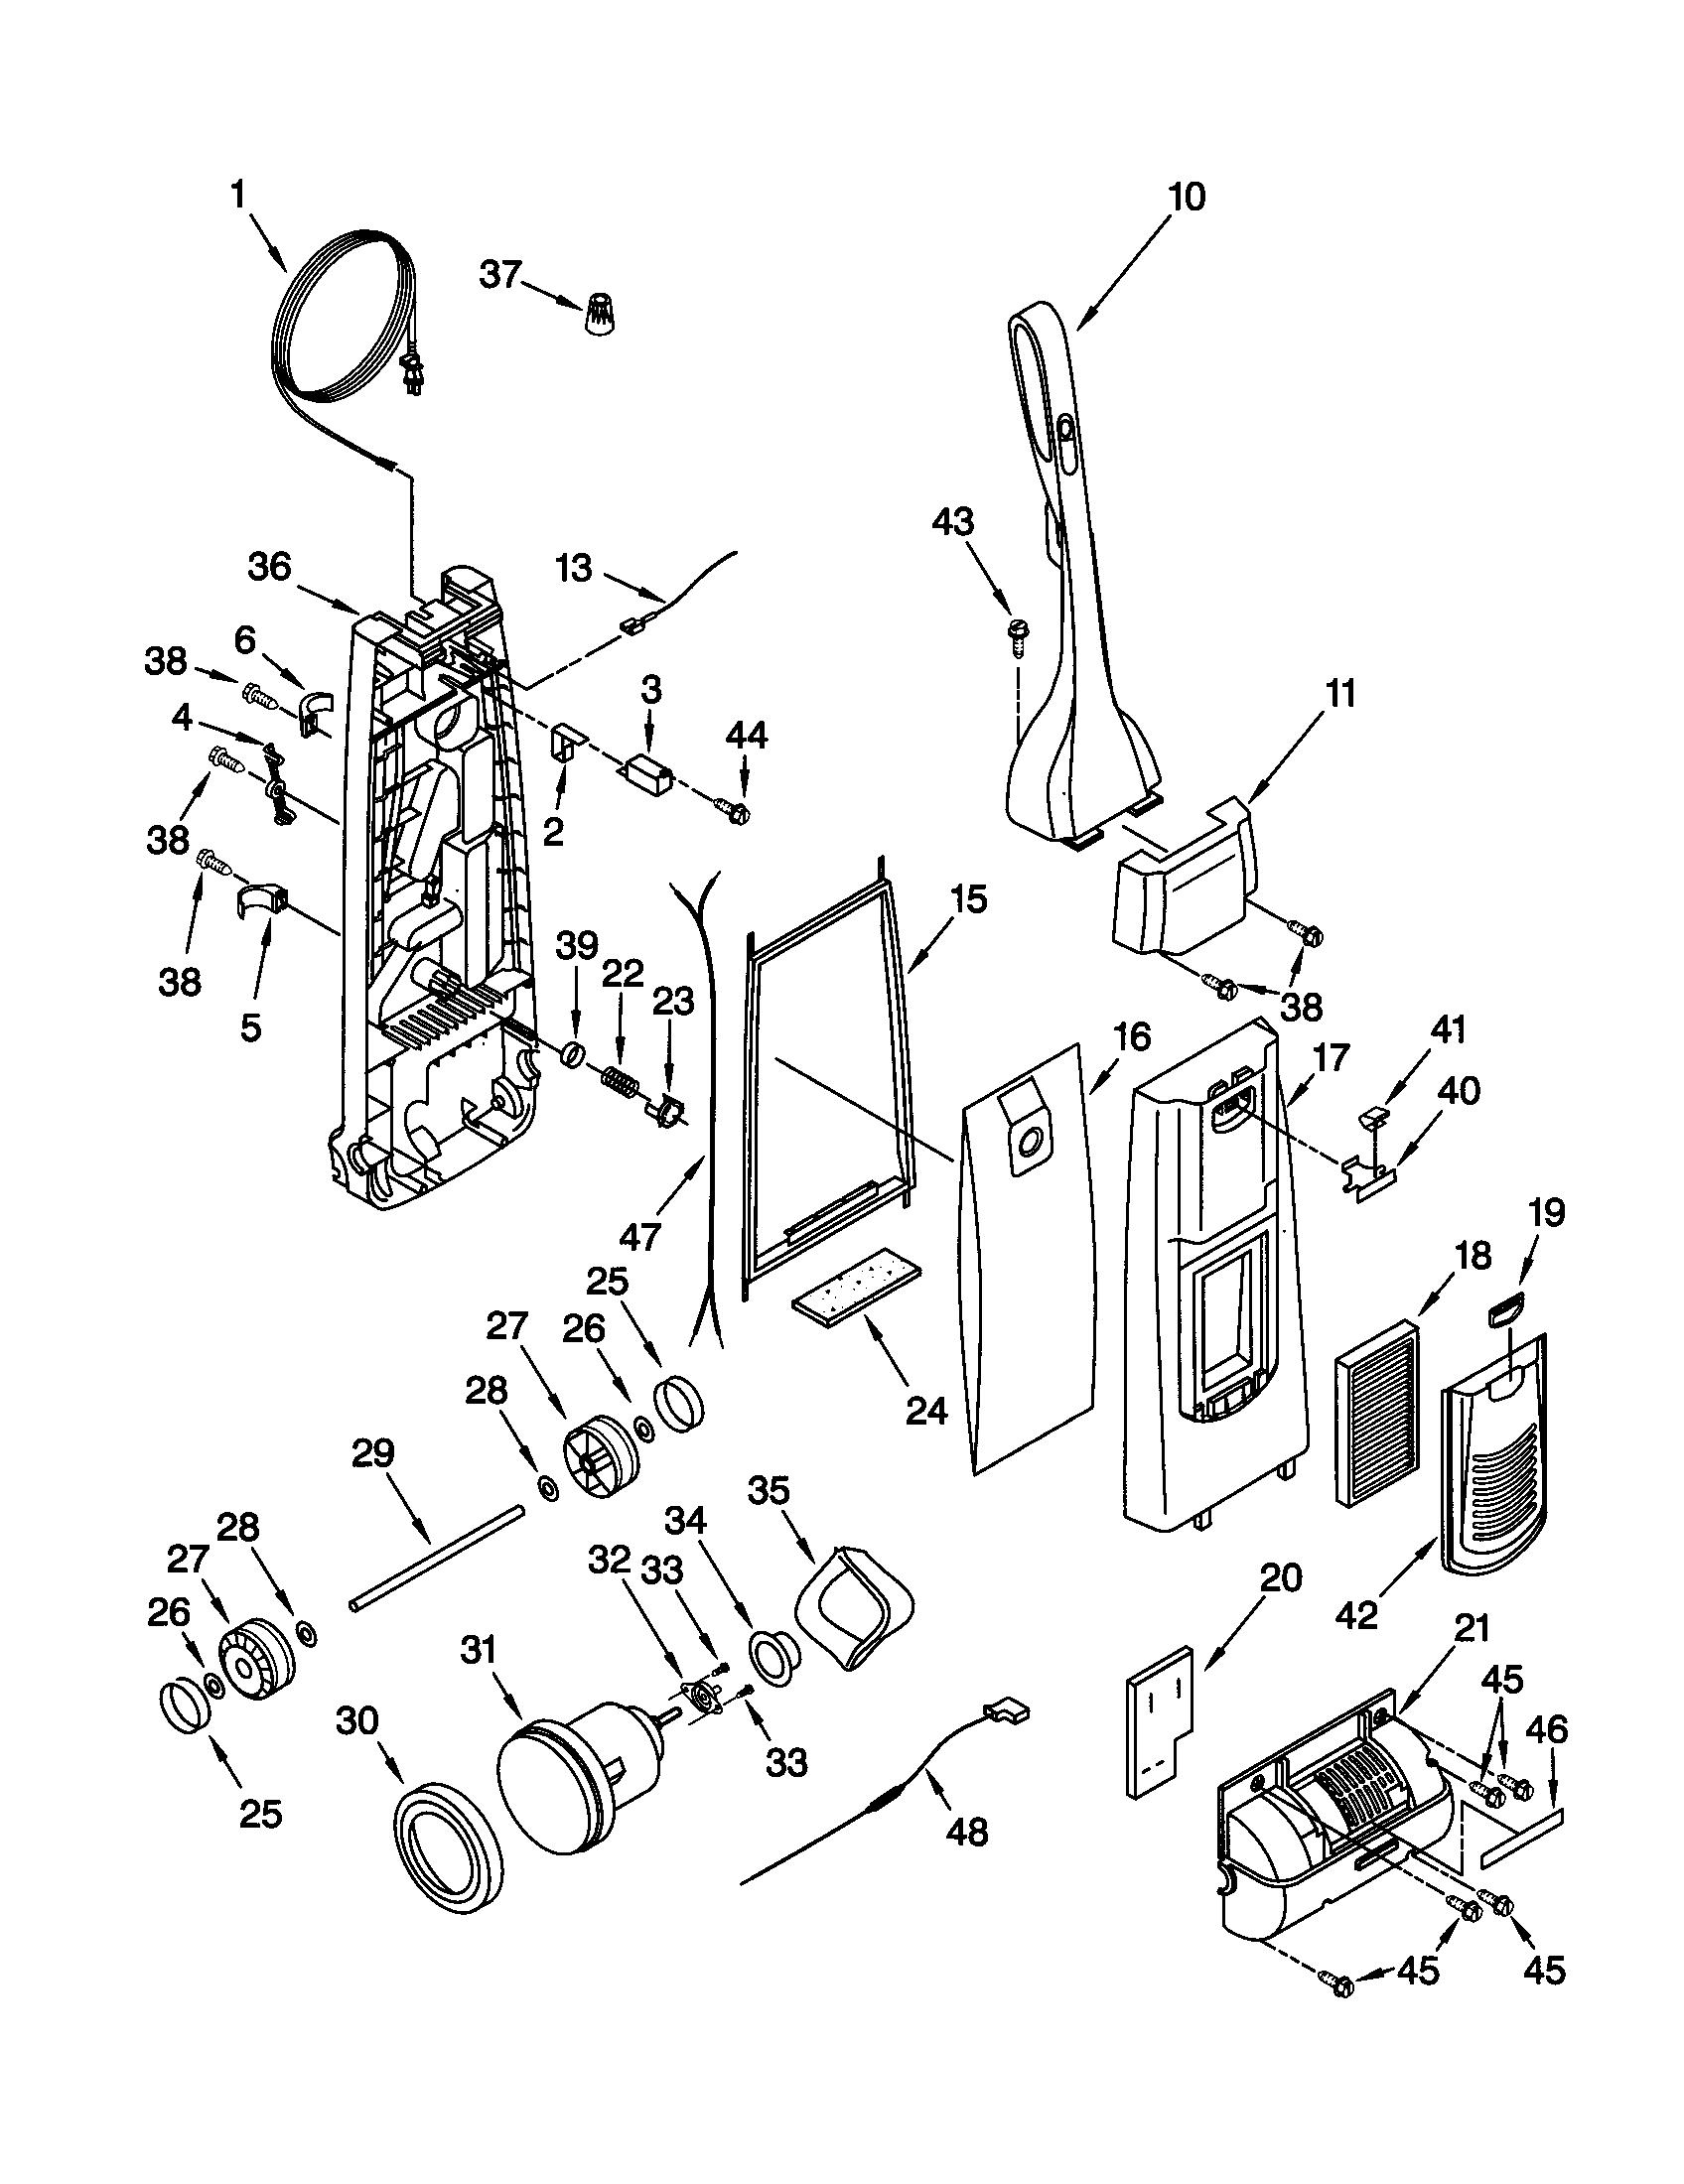 Kenmore model 116 wiring diagram kenmore free wiring diagrams wiring diagram